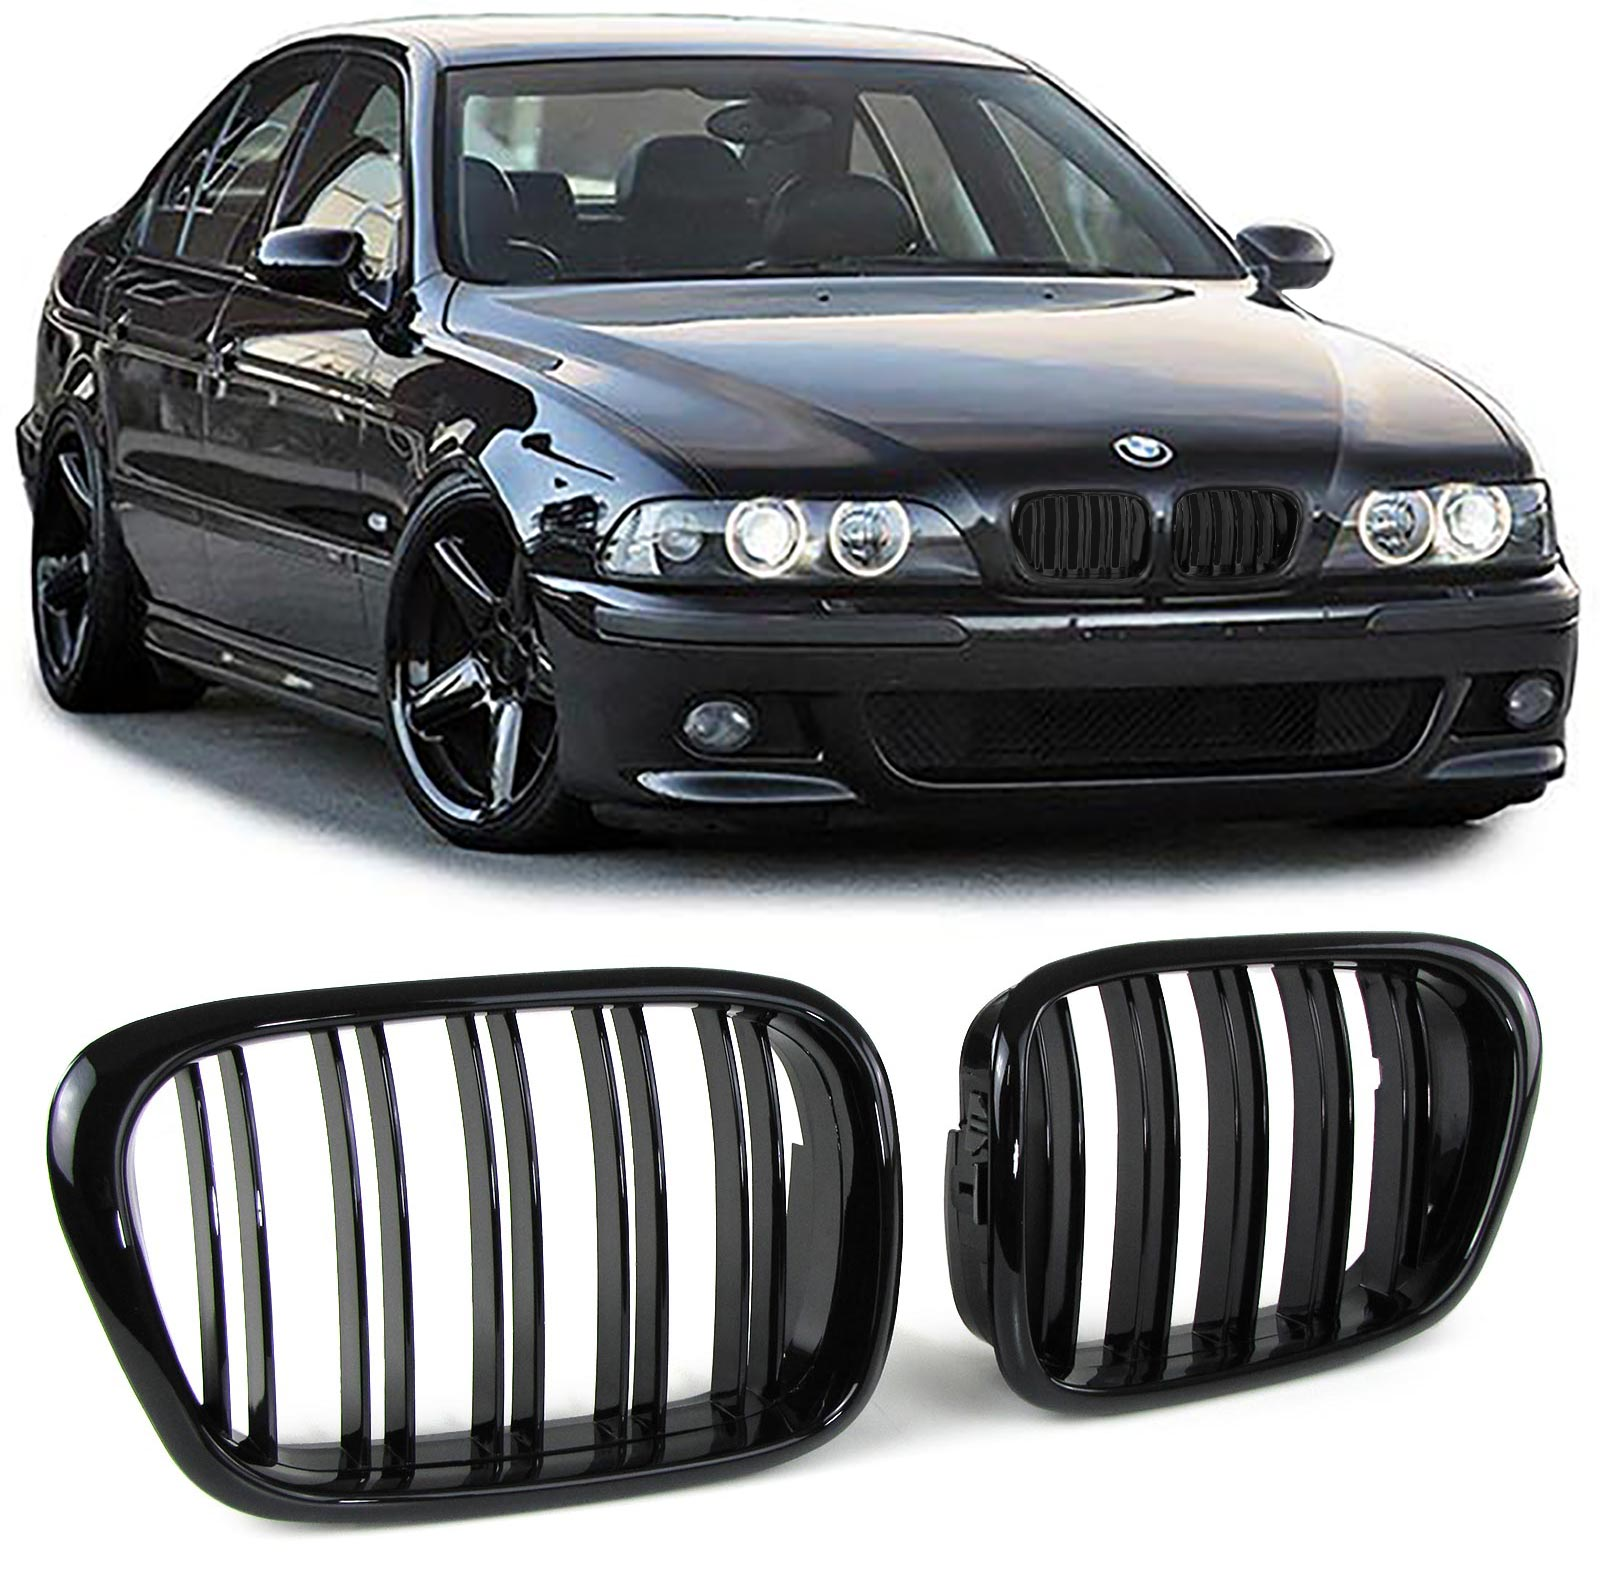 Kαρδίες μαύρες BMW E39 Look M4